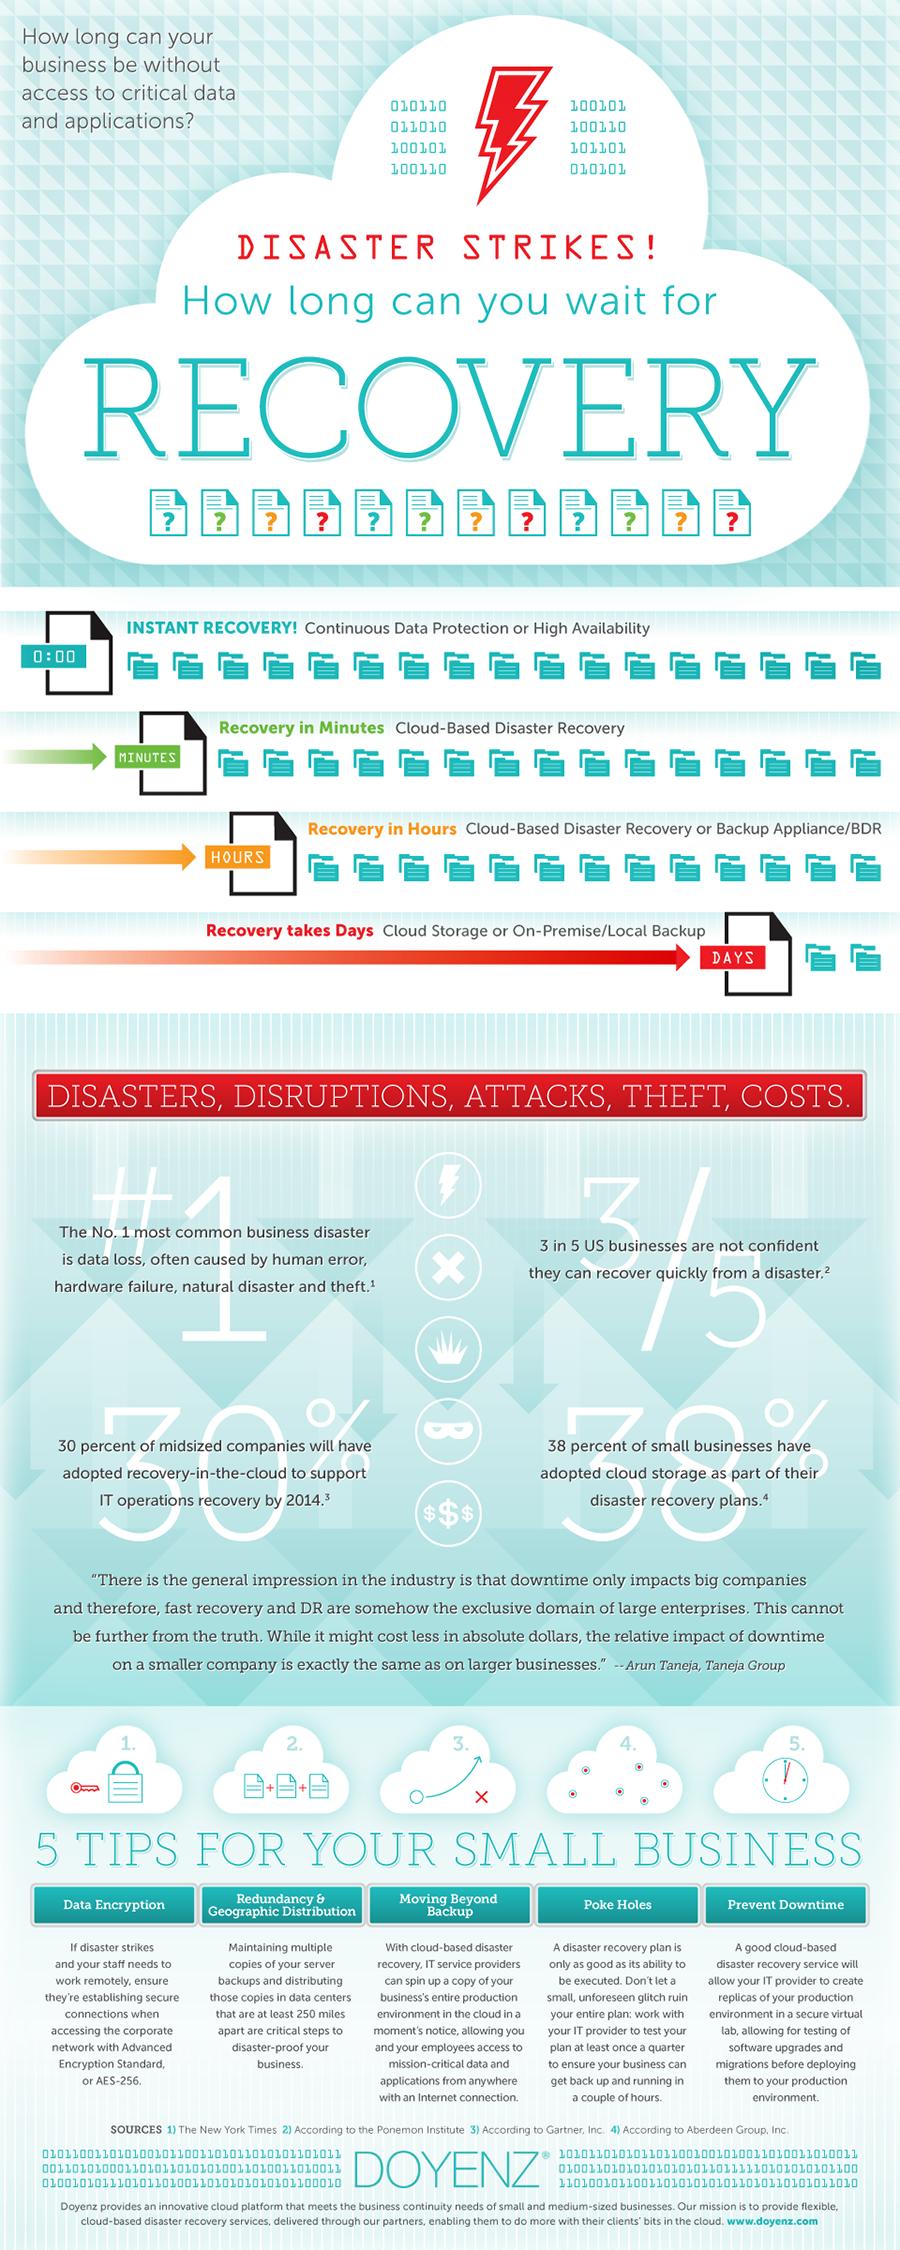 jkdc_infographic-doyenz.jpg